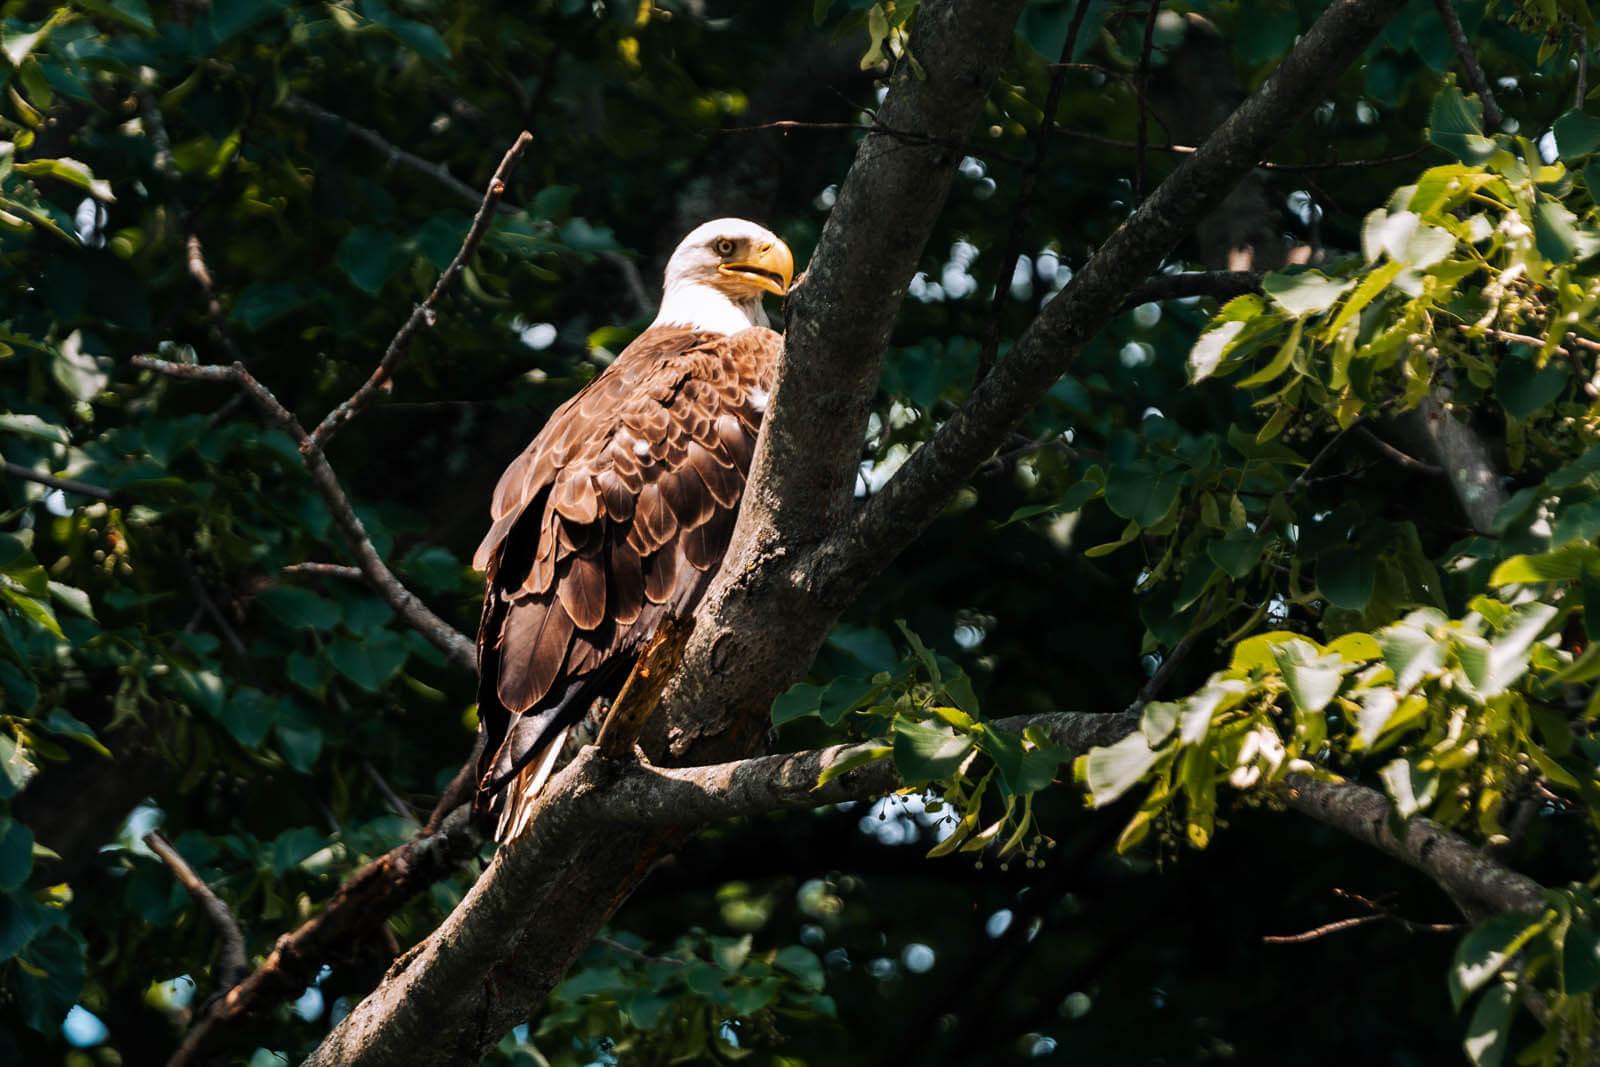 Bald Eagle sighting along the Delaware River in Narrowsburg New York